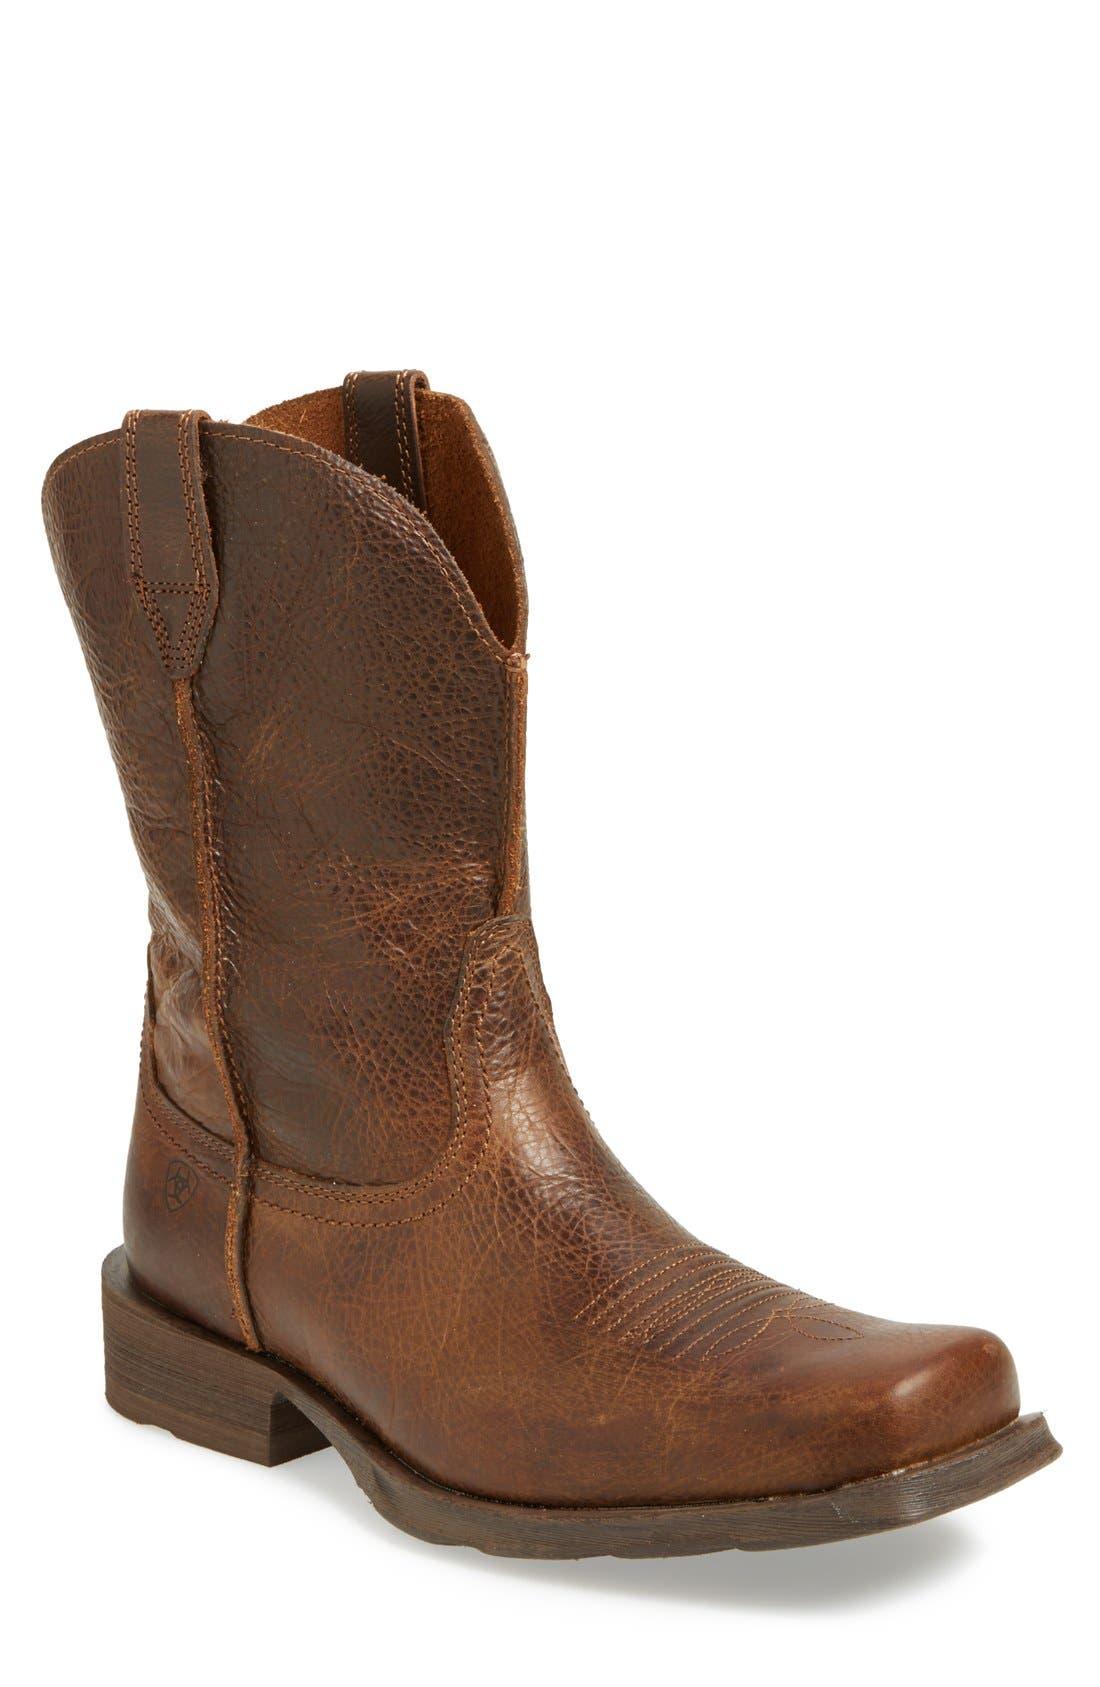 Ariat 'Rambler' Square Toe Leather Cowboy Boot (Men)